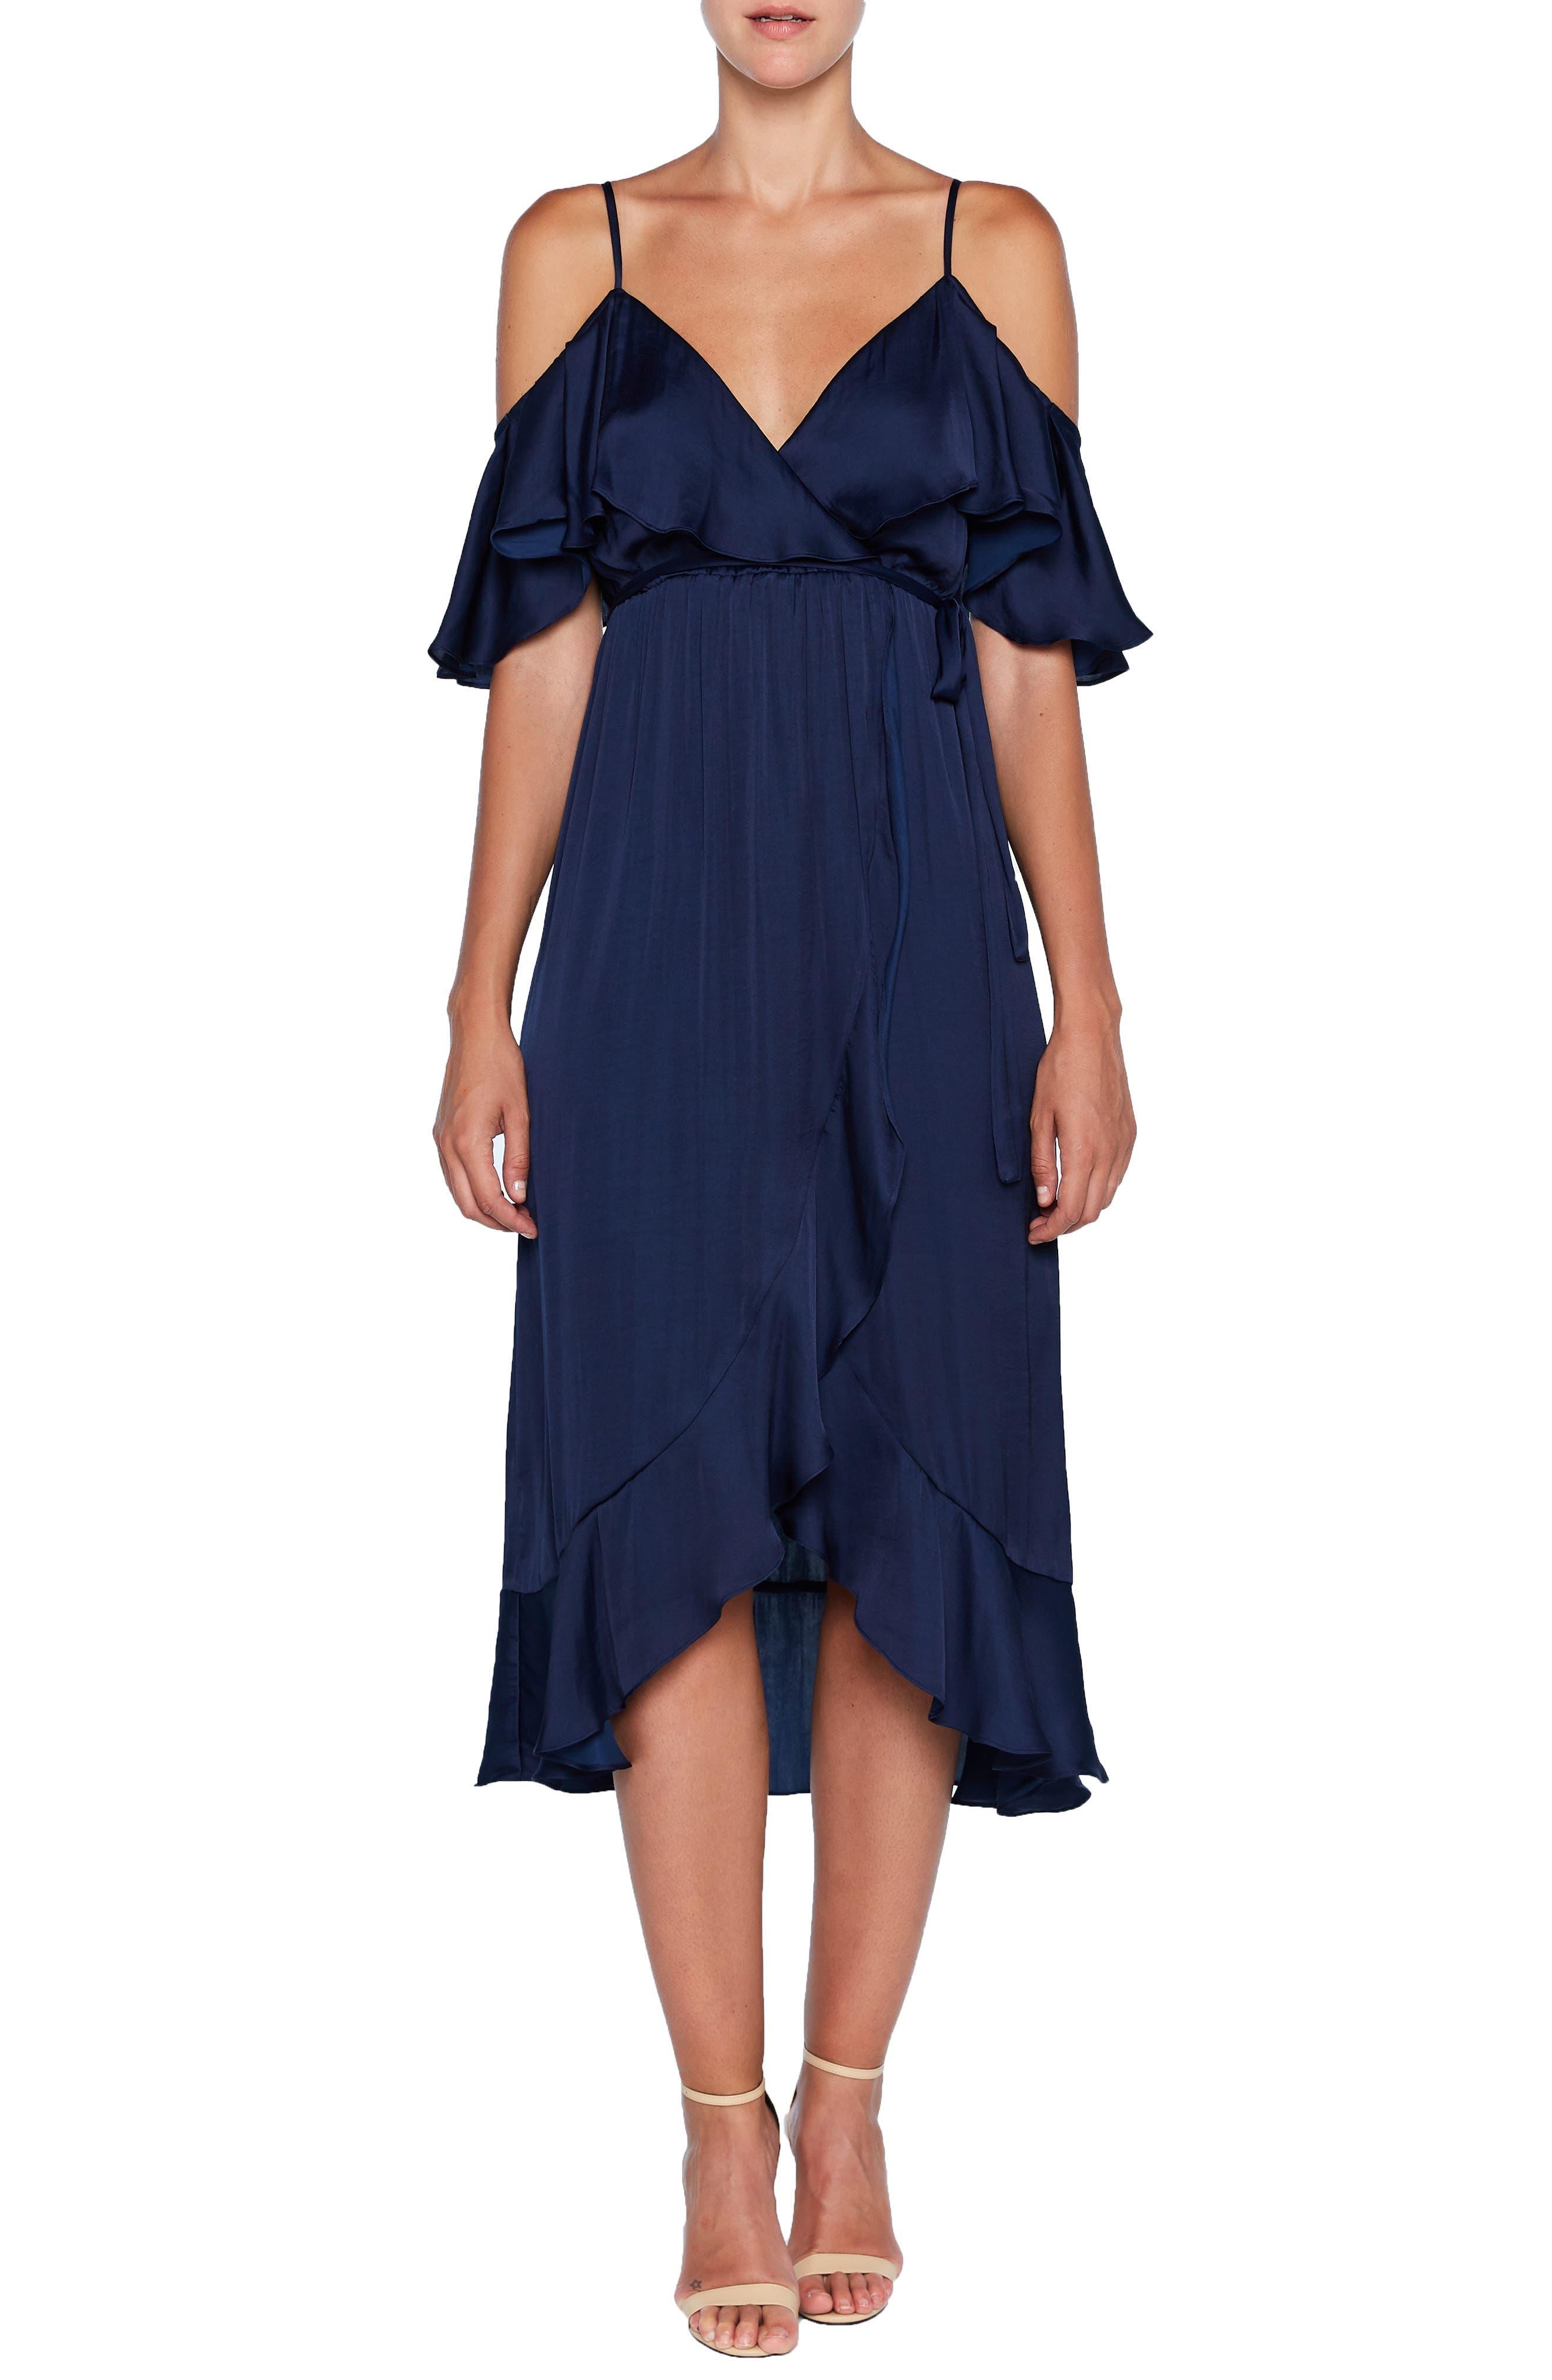 899e2a525e14 Women's Cold Shoulder Dresses | Nordstrom